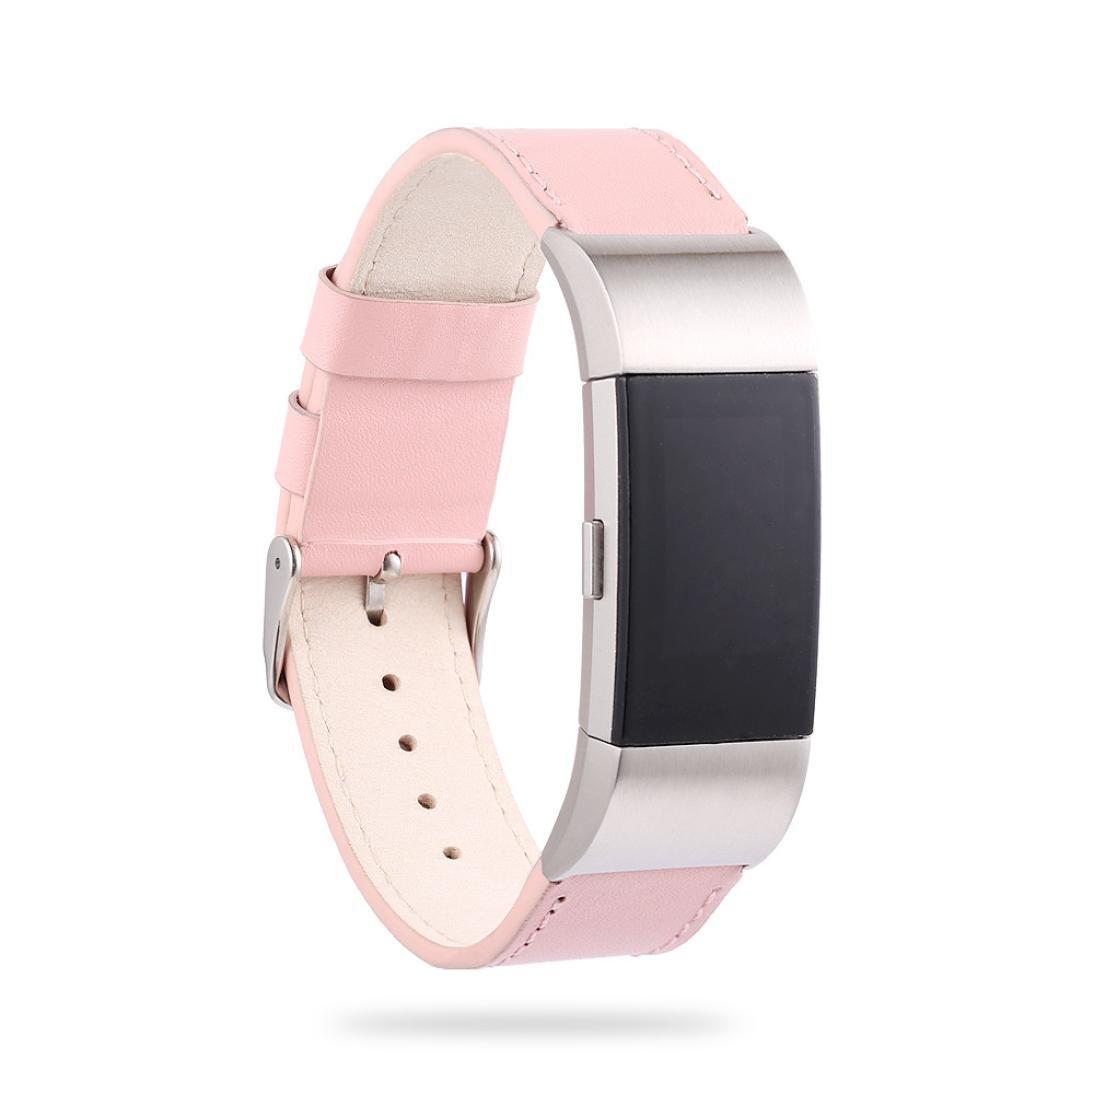 inverlee新しいラグジュアリーレザーバンドブレスレットウォッチバンドfor Fitbit Charge 2 Smart Watch  ピンク B076CDPMDL